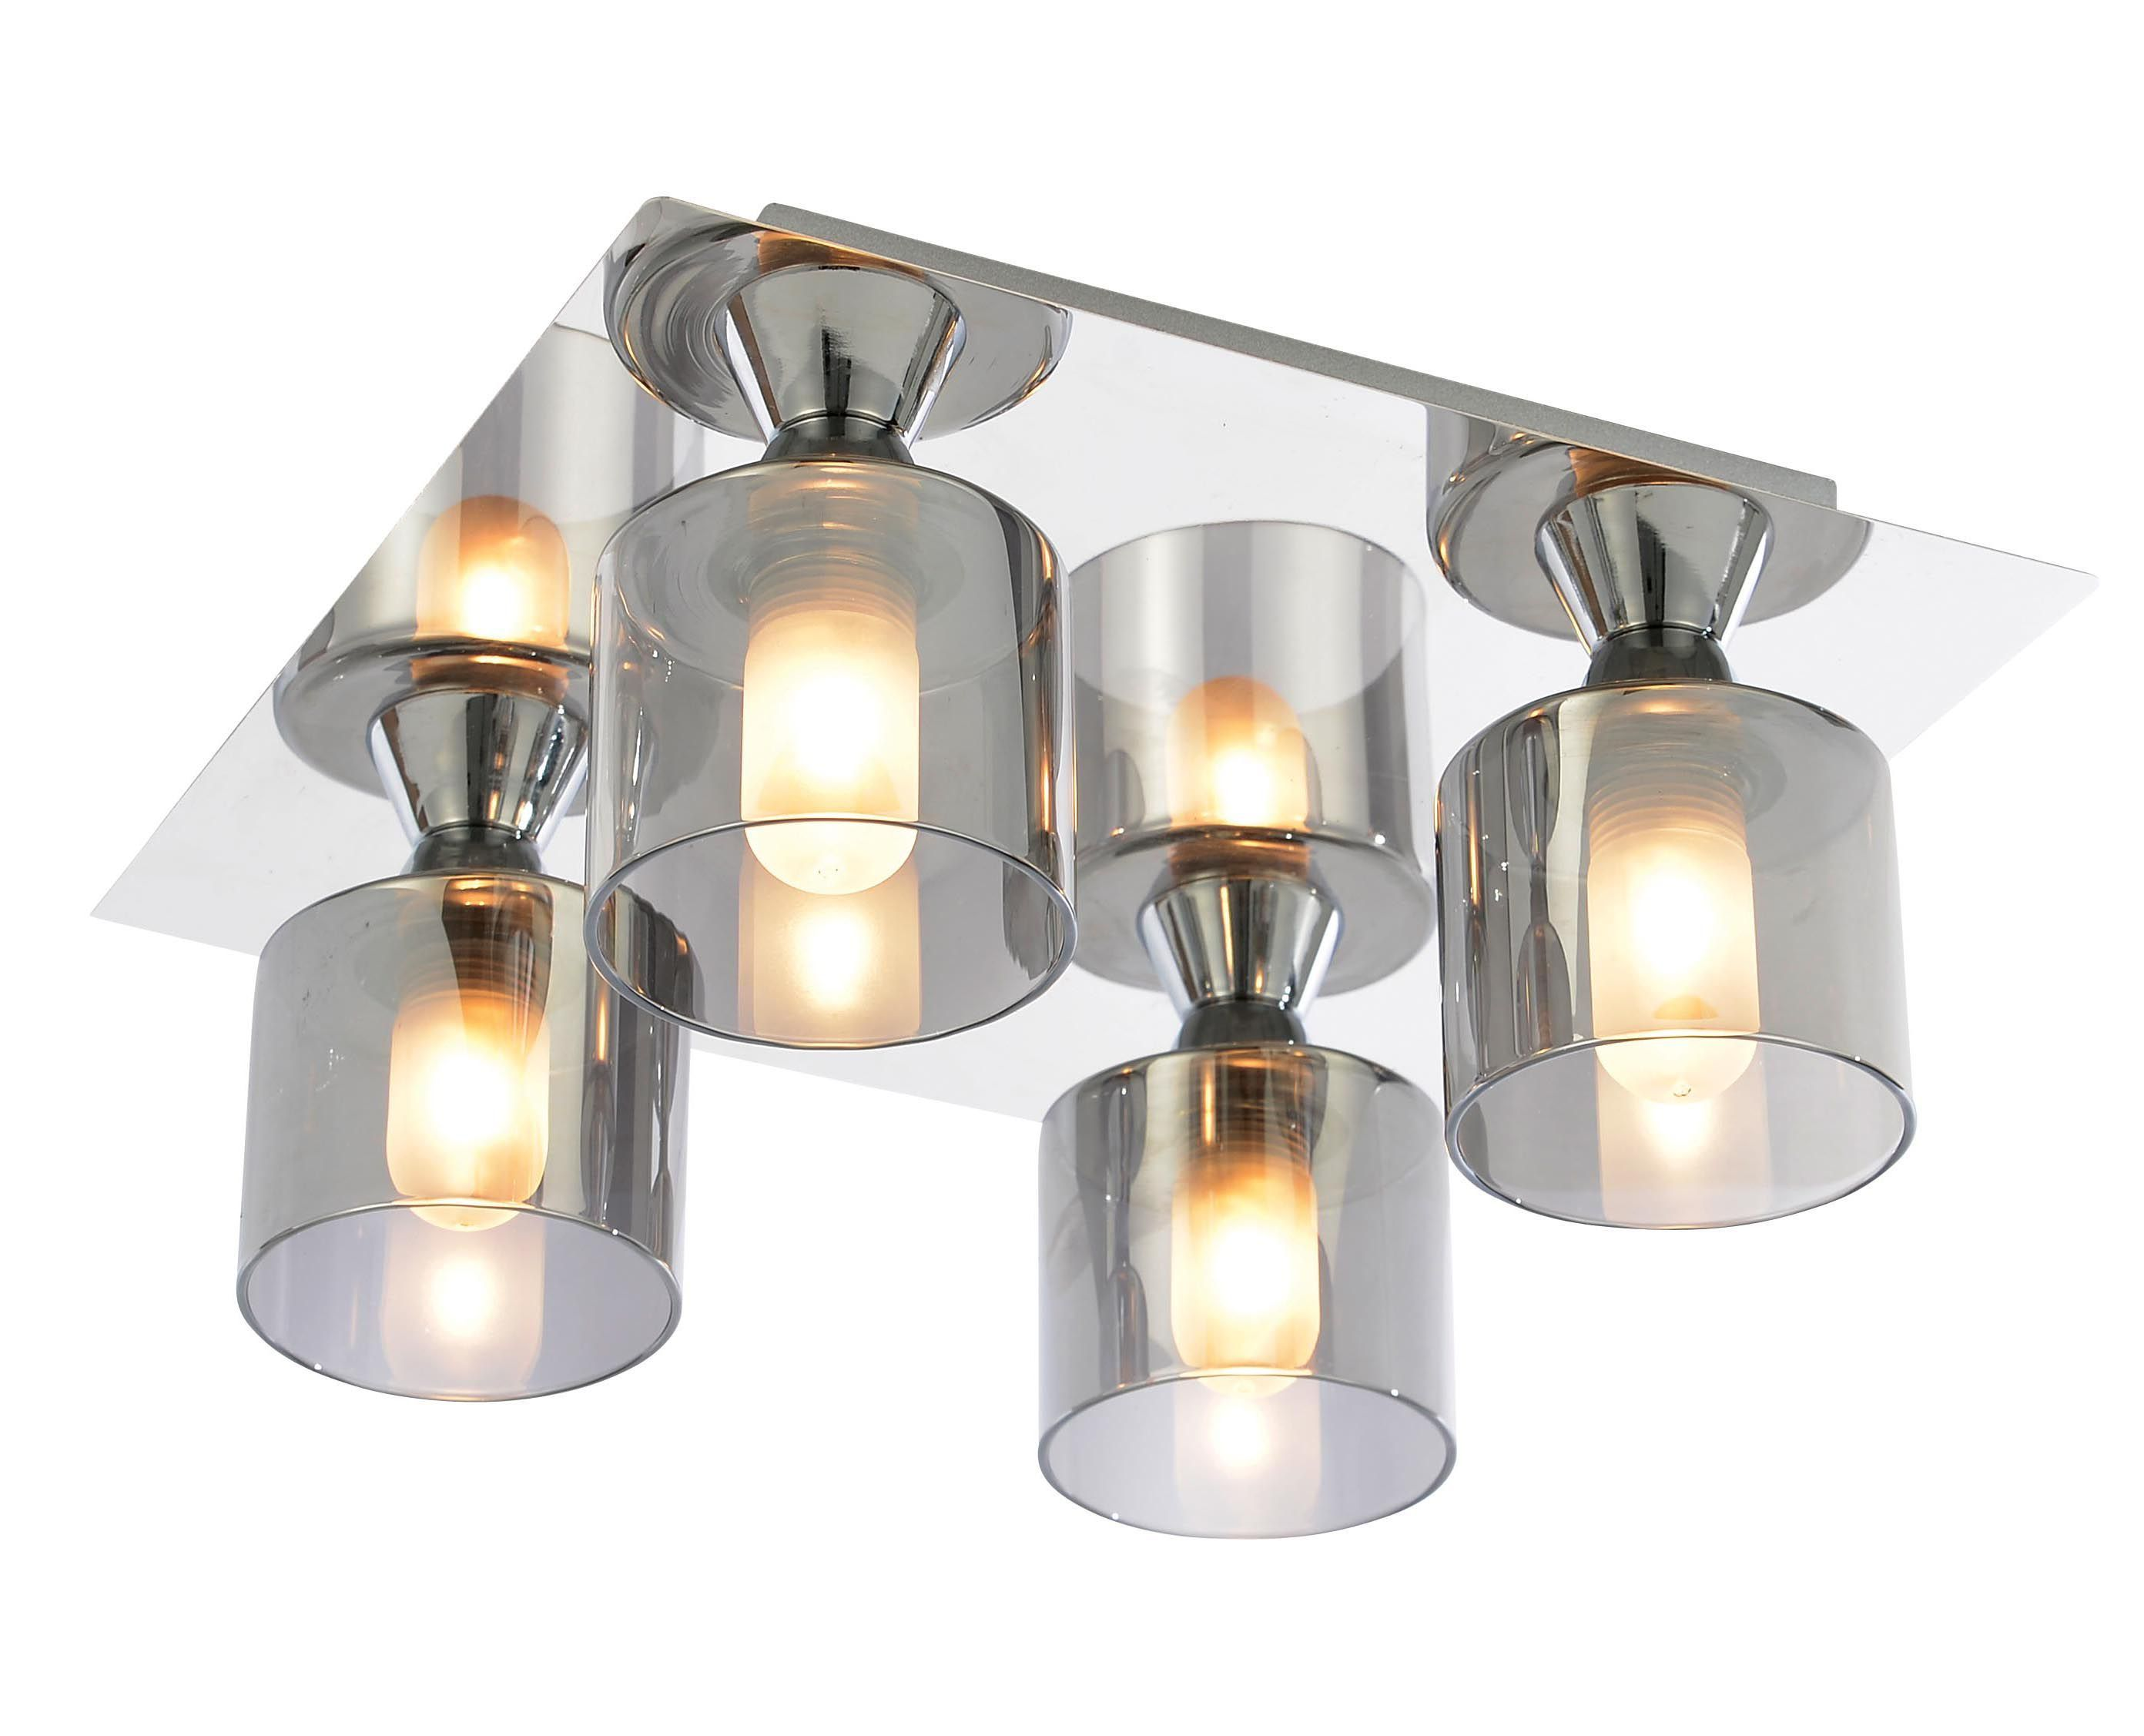 Cobark Clear Smoked Effect 4 Lamp Bathroom Ceiling Light  Ceiling Brilliant Bathroom Ceiling Light Inspiration Design